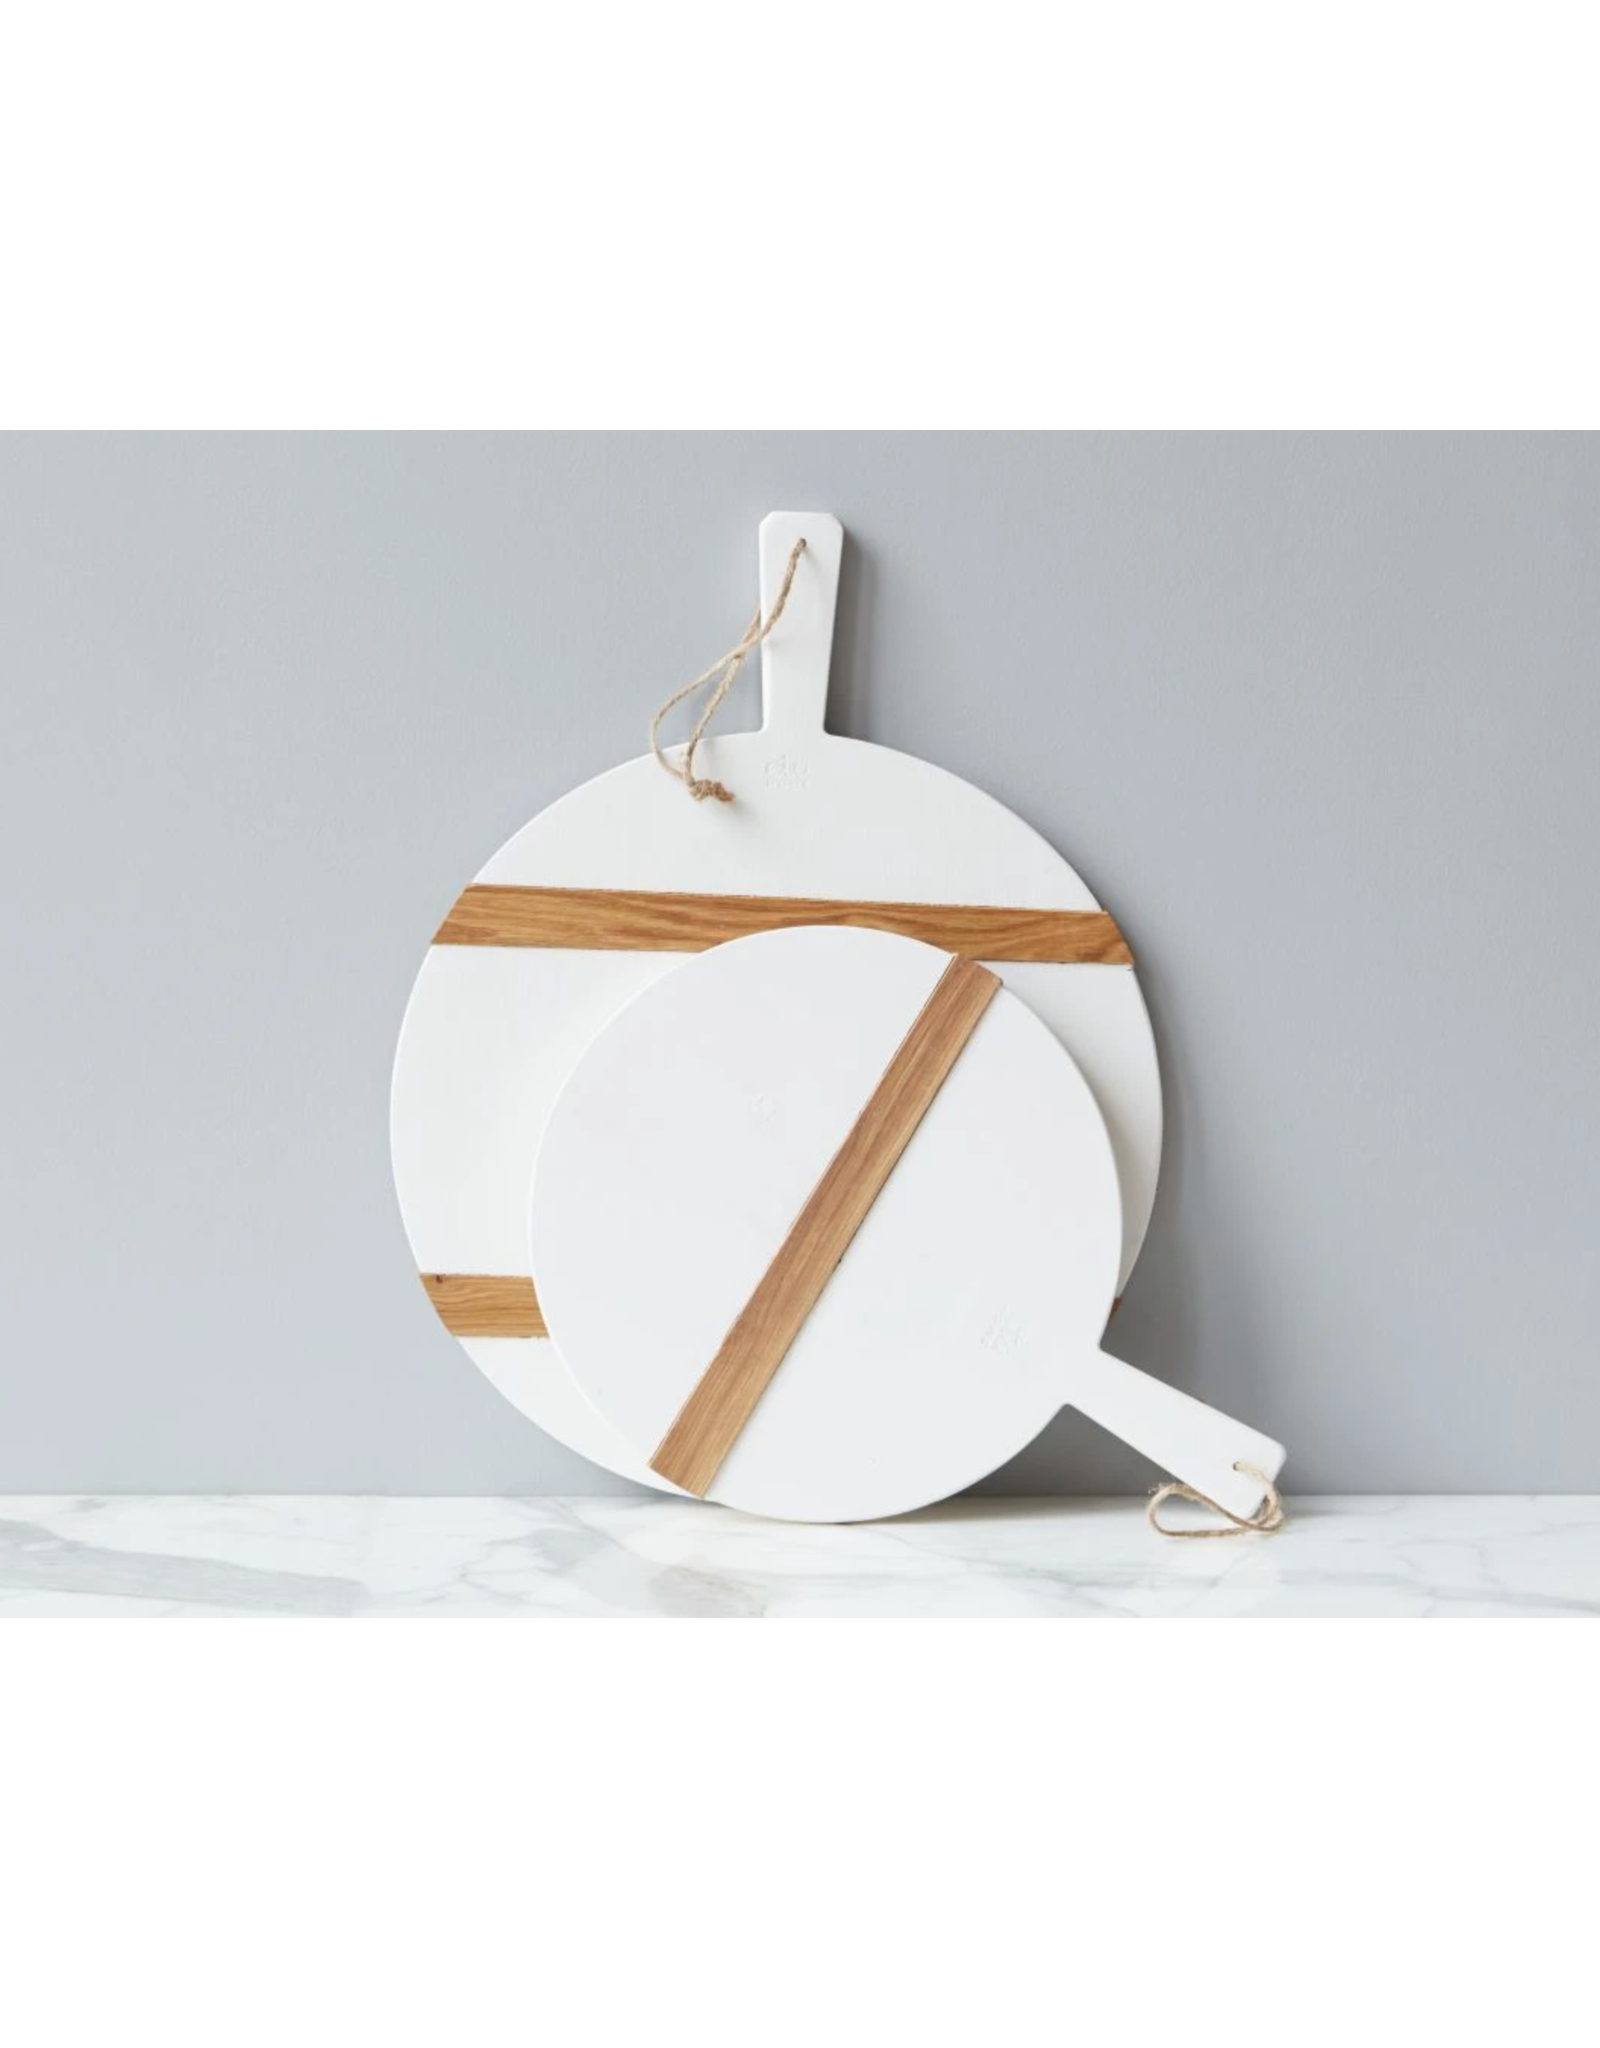 White Mod Charcuterie -Medium Round